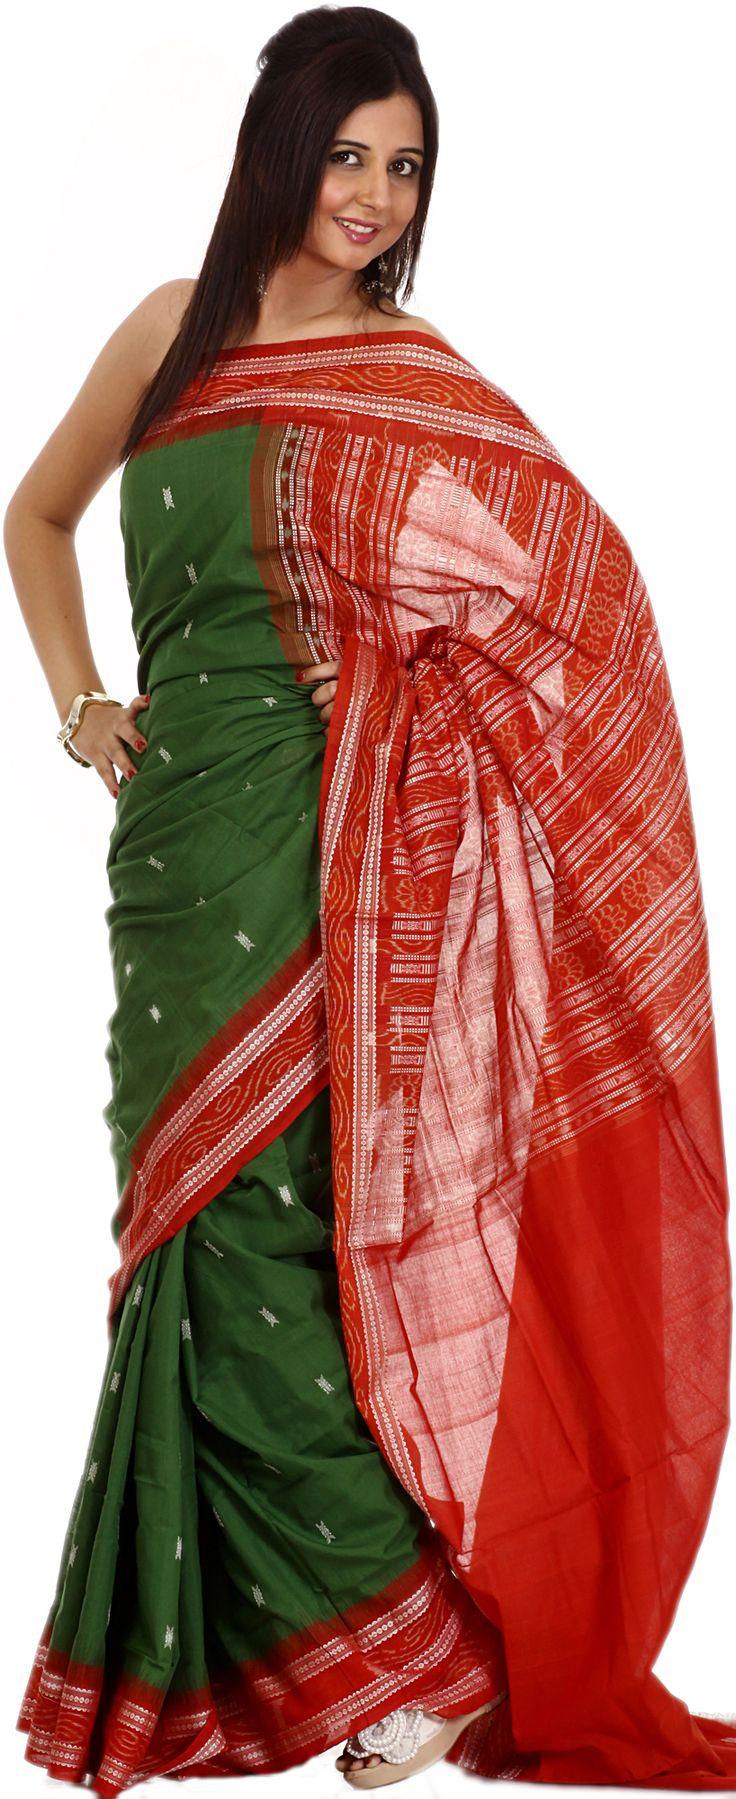 Medium-Green Bomkai Sari from Orissa with All-Over Woven Bootis and Rudraksha Border